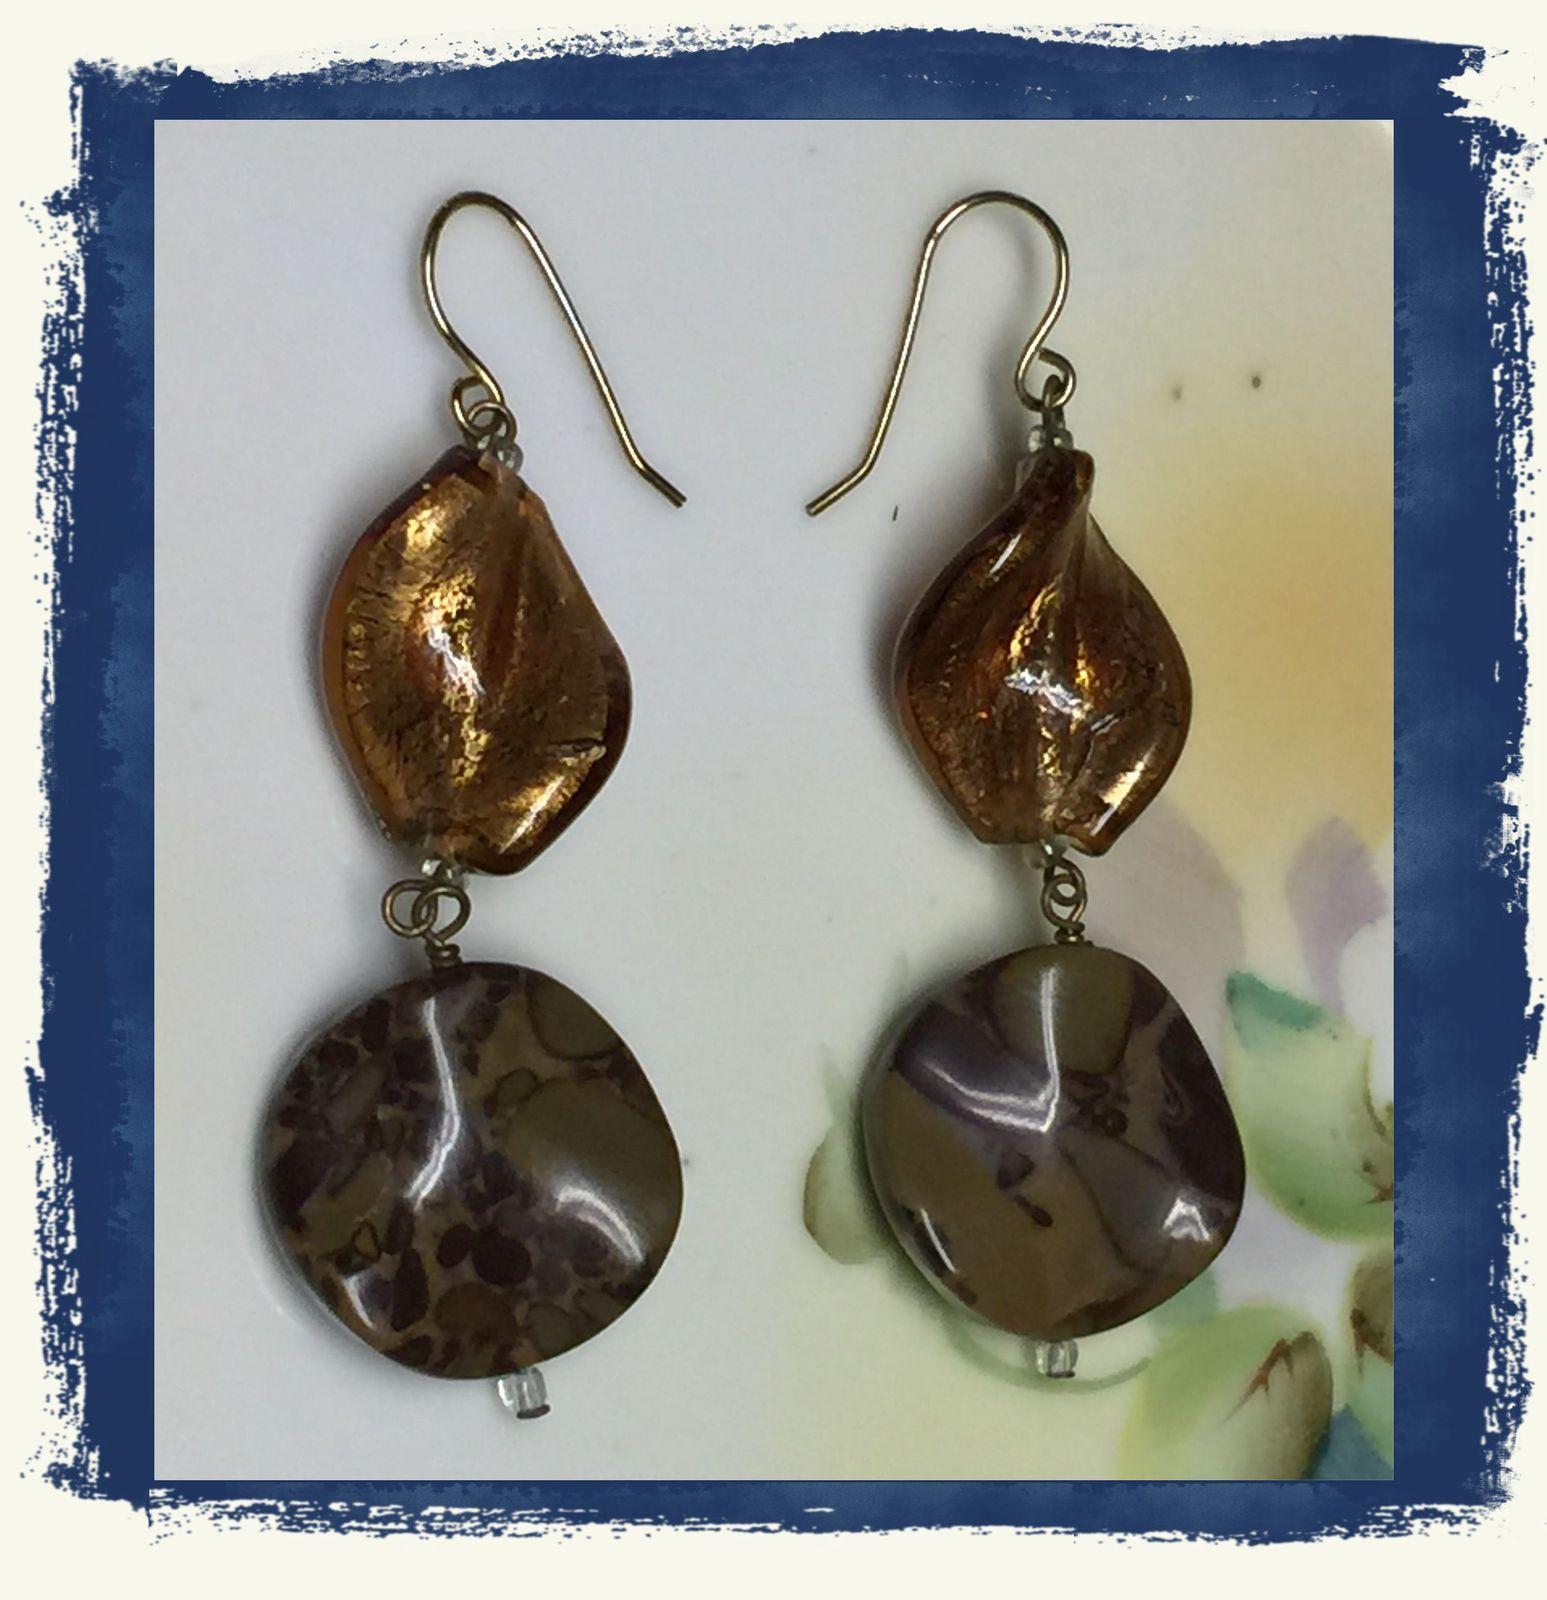 VTG Gold Metallic Brown Marble Look Plastic Beads Long Dangling Pierced Earrings